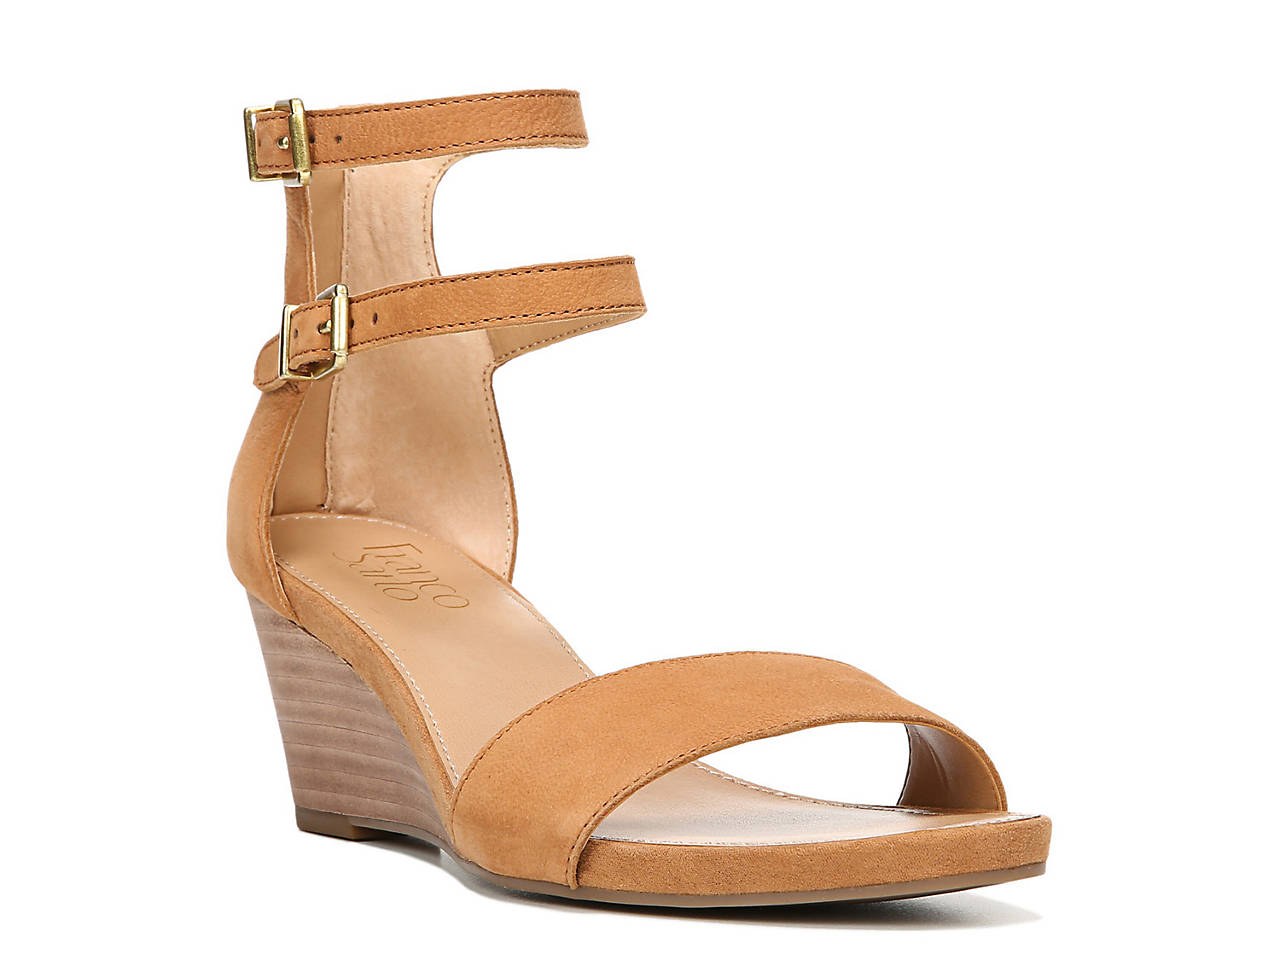 318614d5507 Franco Sarto Dade Wedge Sandal Women s Shoes